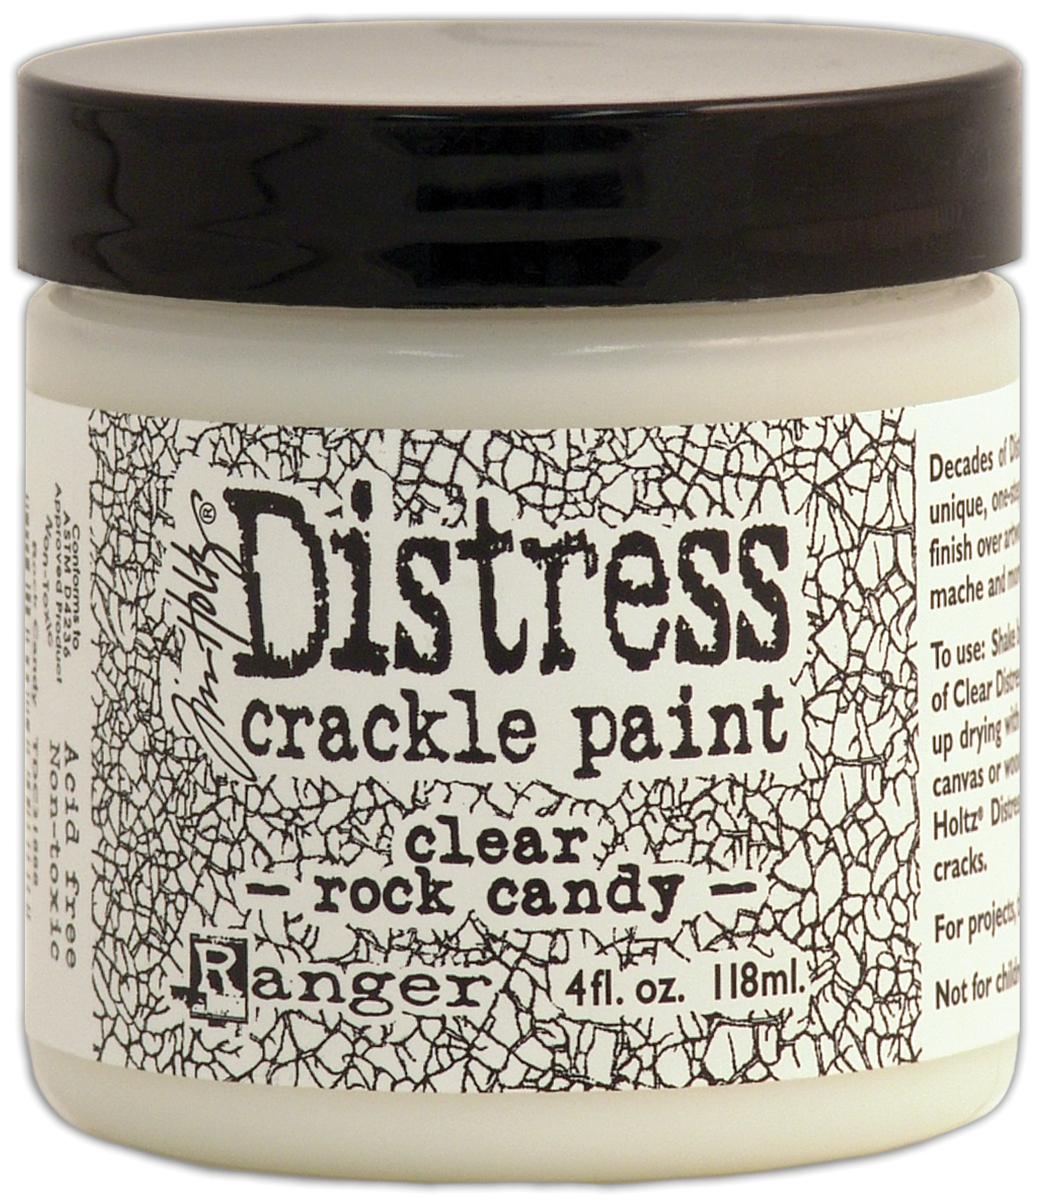 Distress Crackle Paint 4oz-Clear Rock Candy